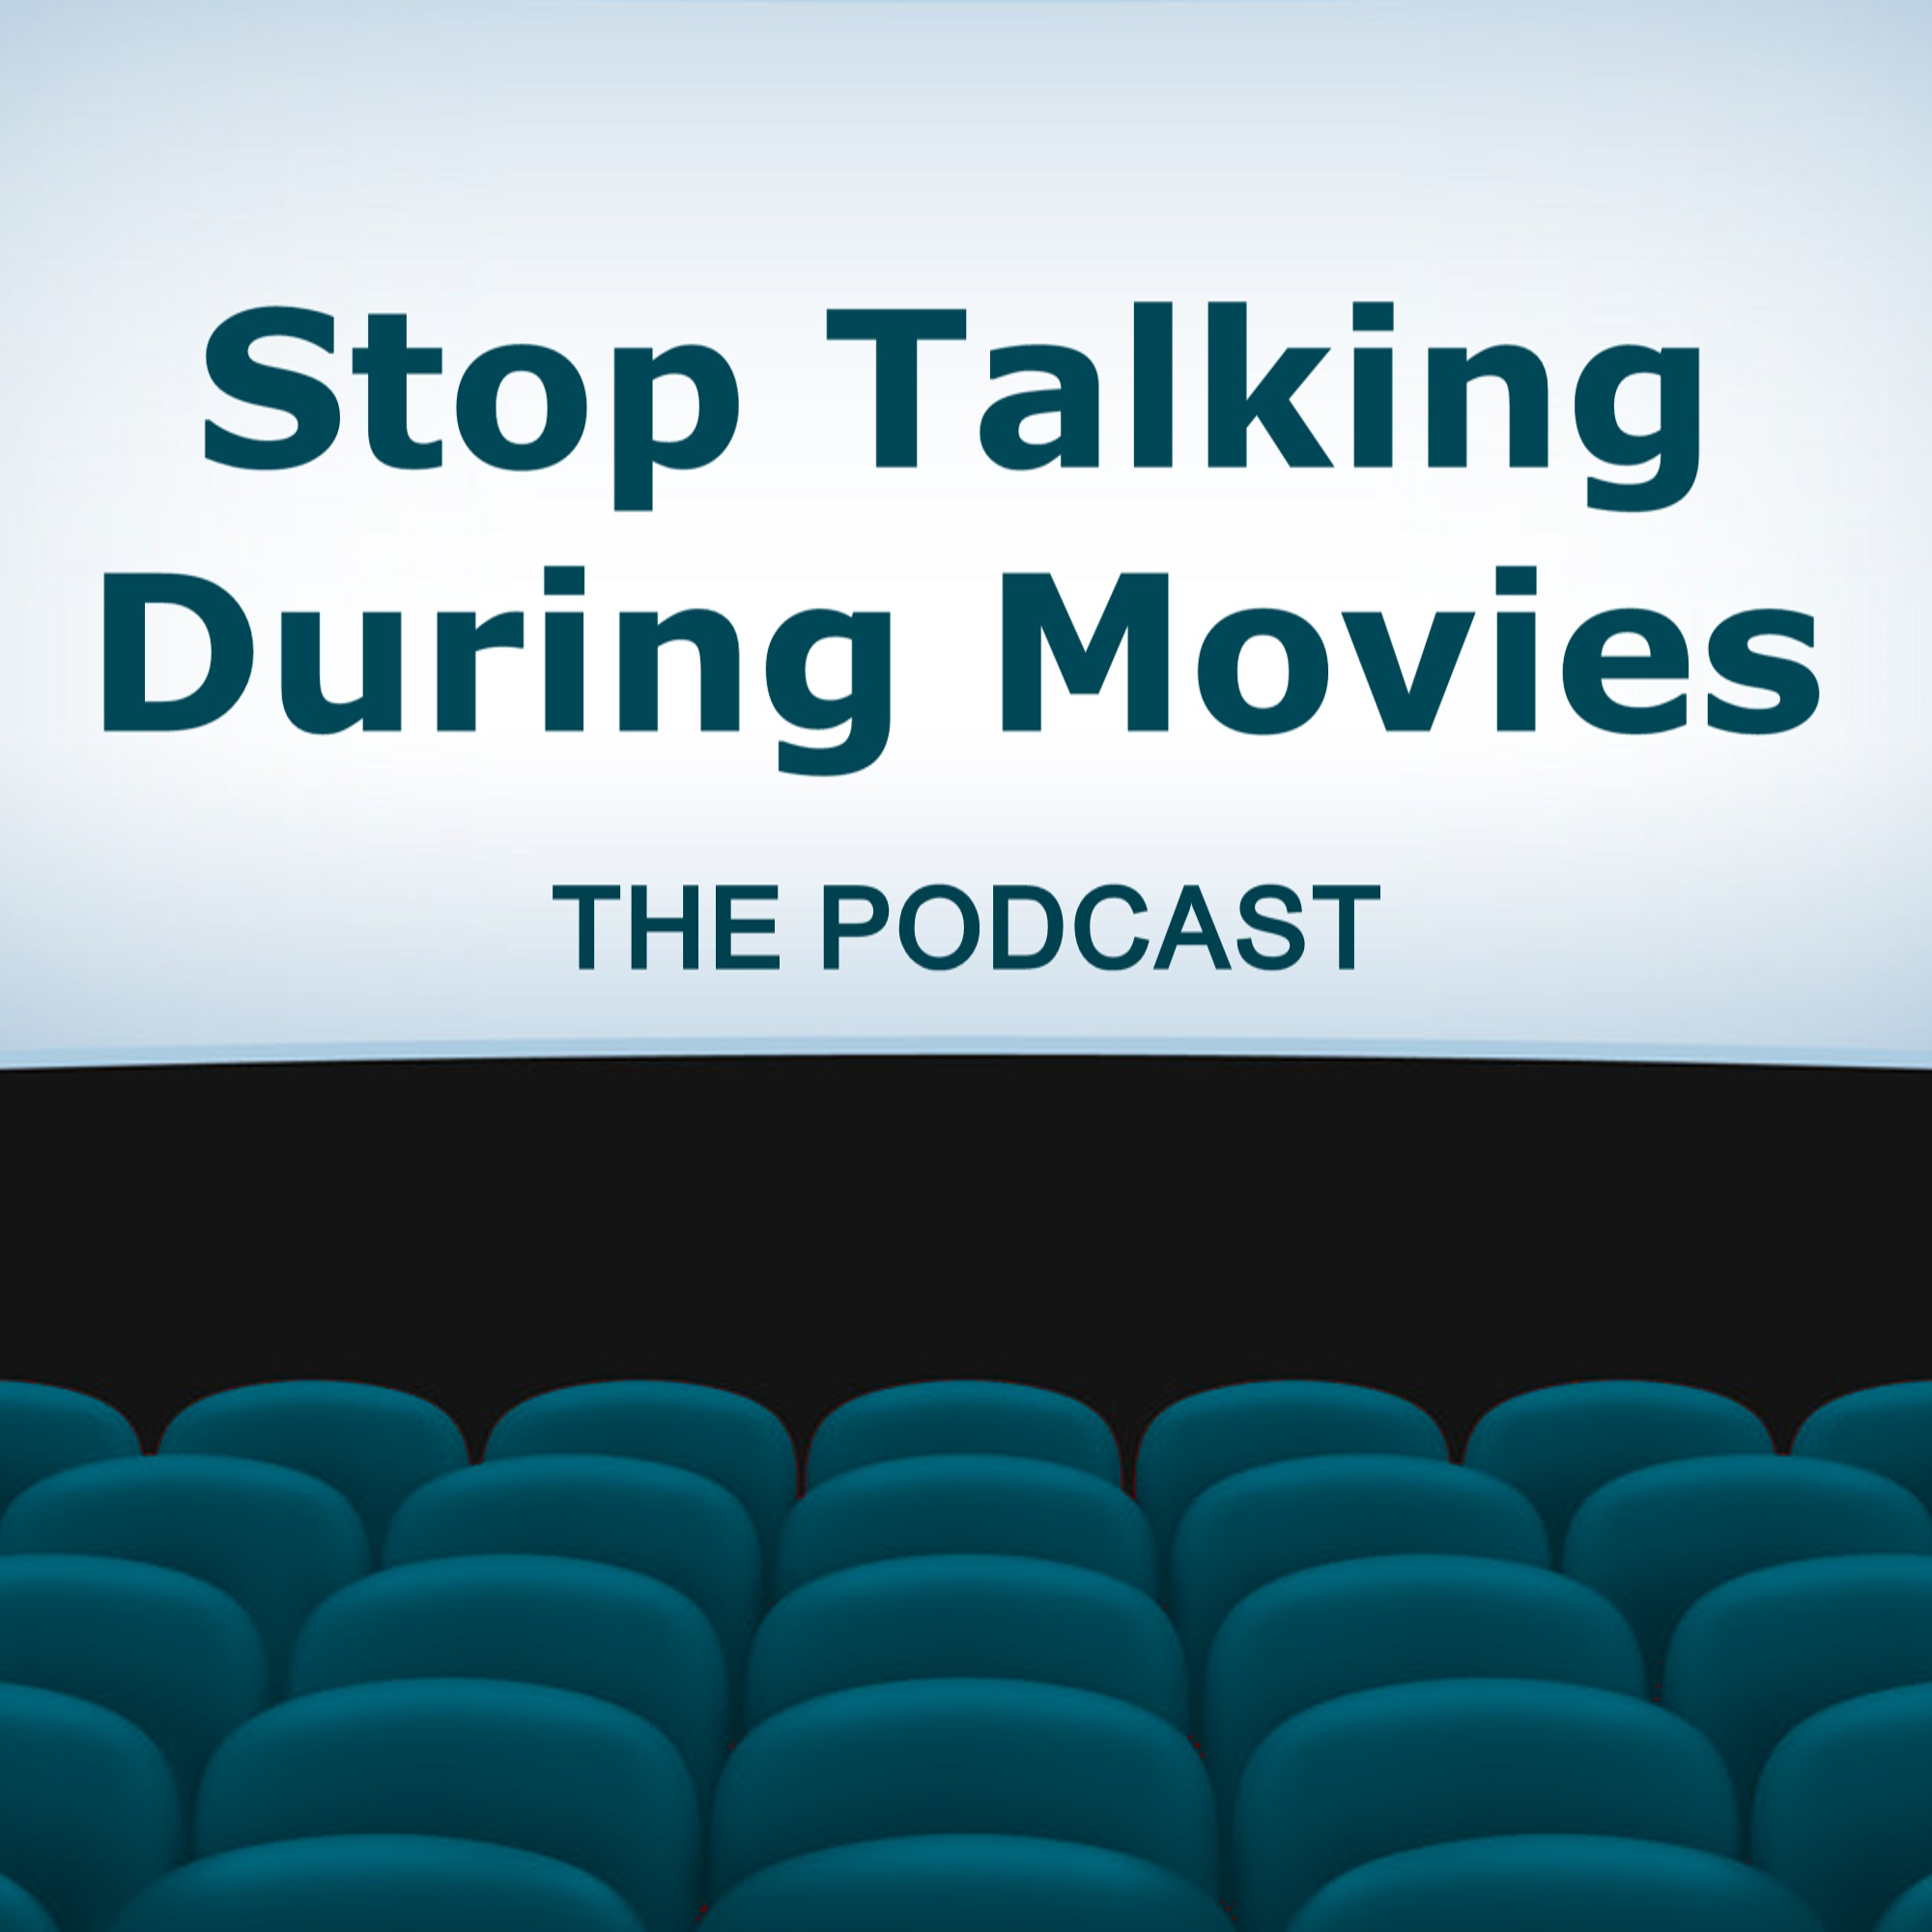 Stop Talking During Movies